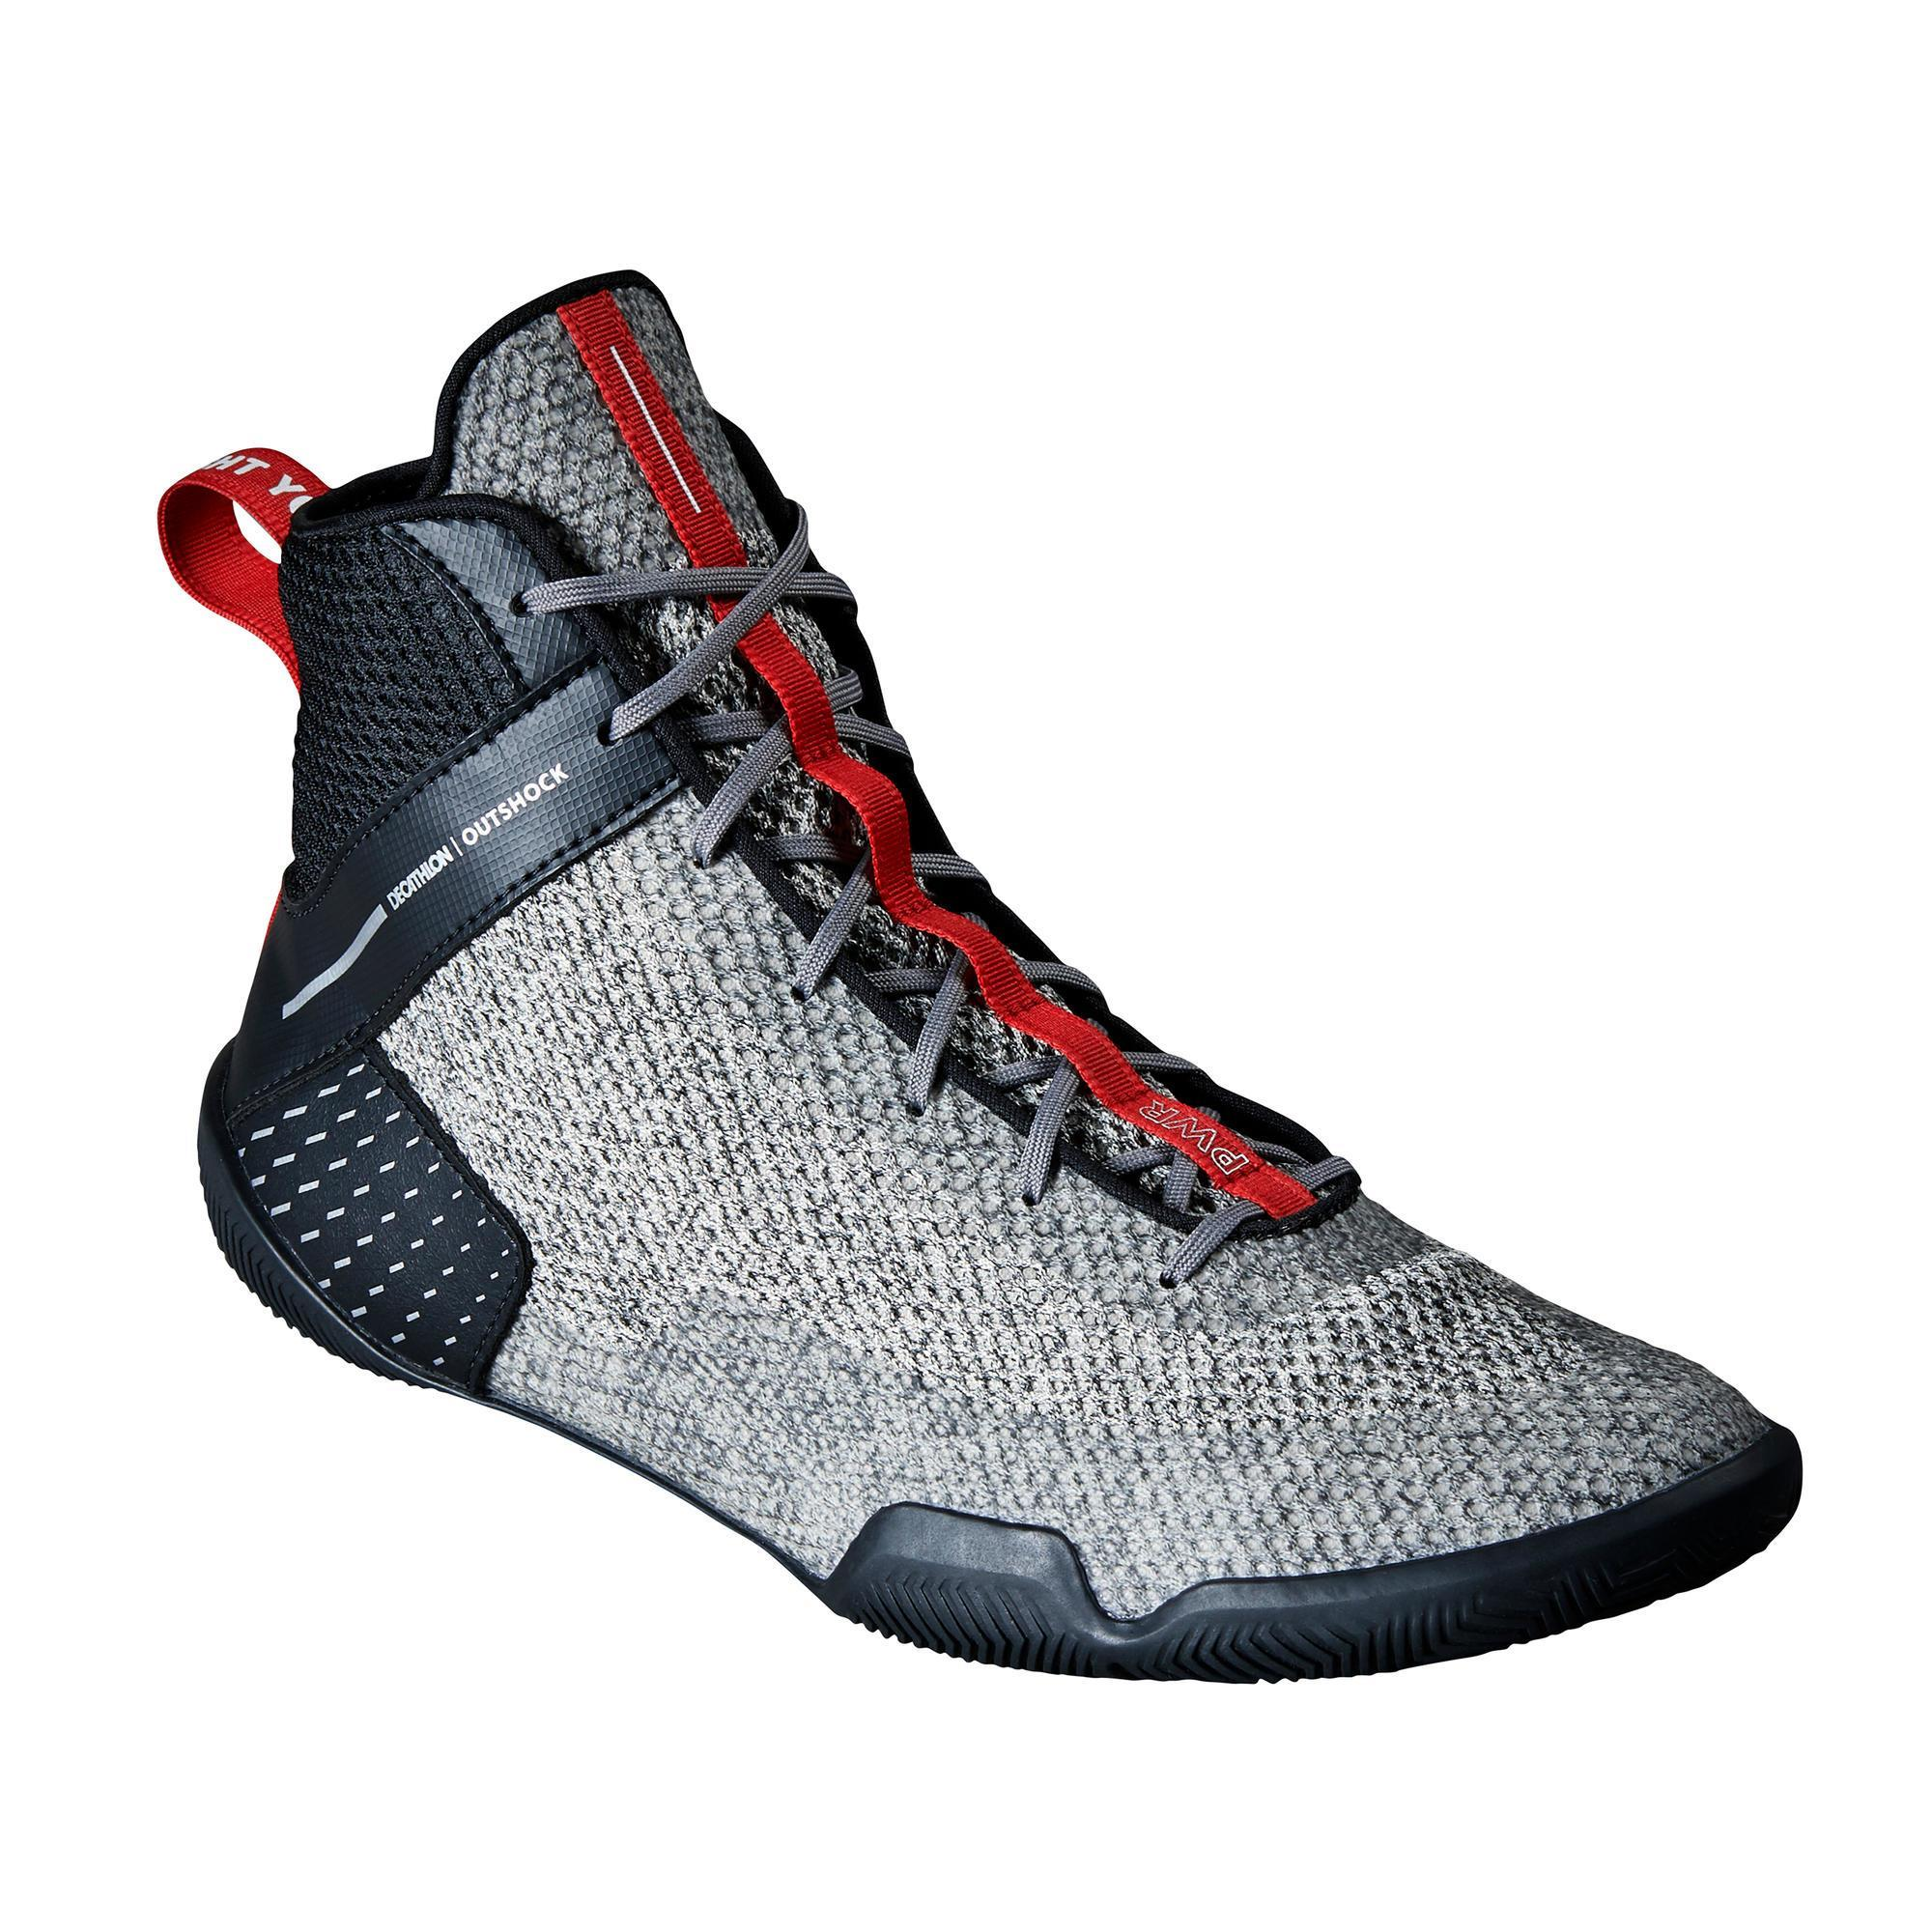 Boxschuhe 500 leicht und flexibel grau | Schuhe > Sportschuhe > Boxschuhe | Outshock